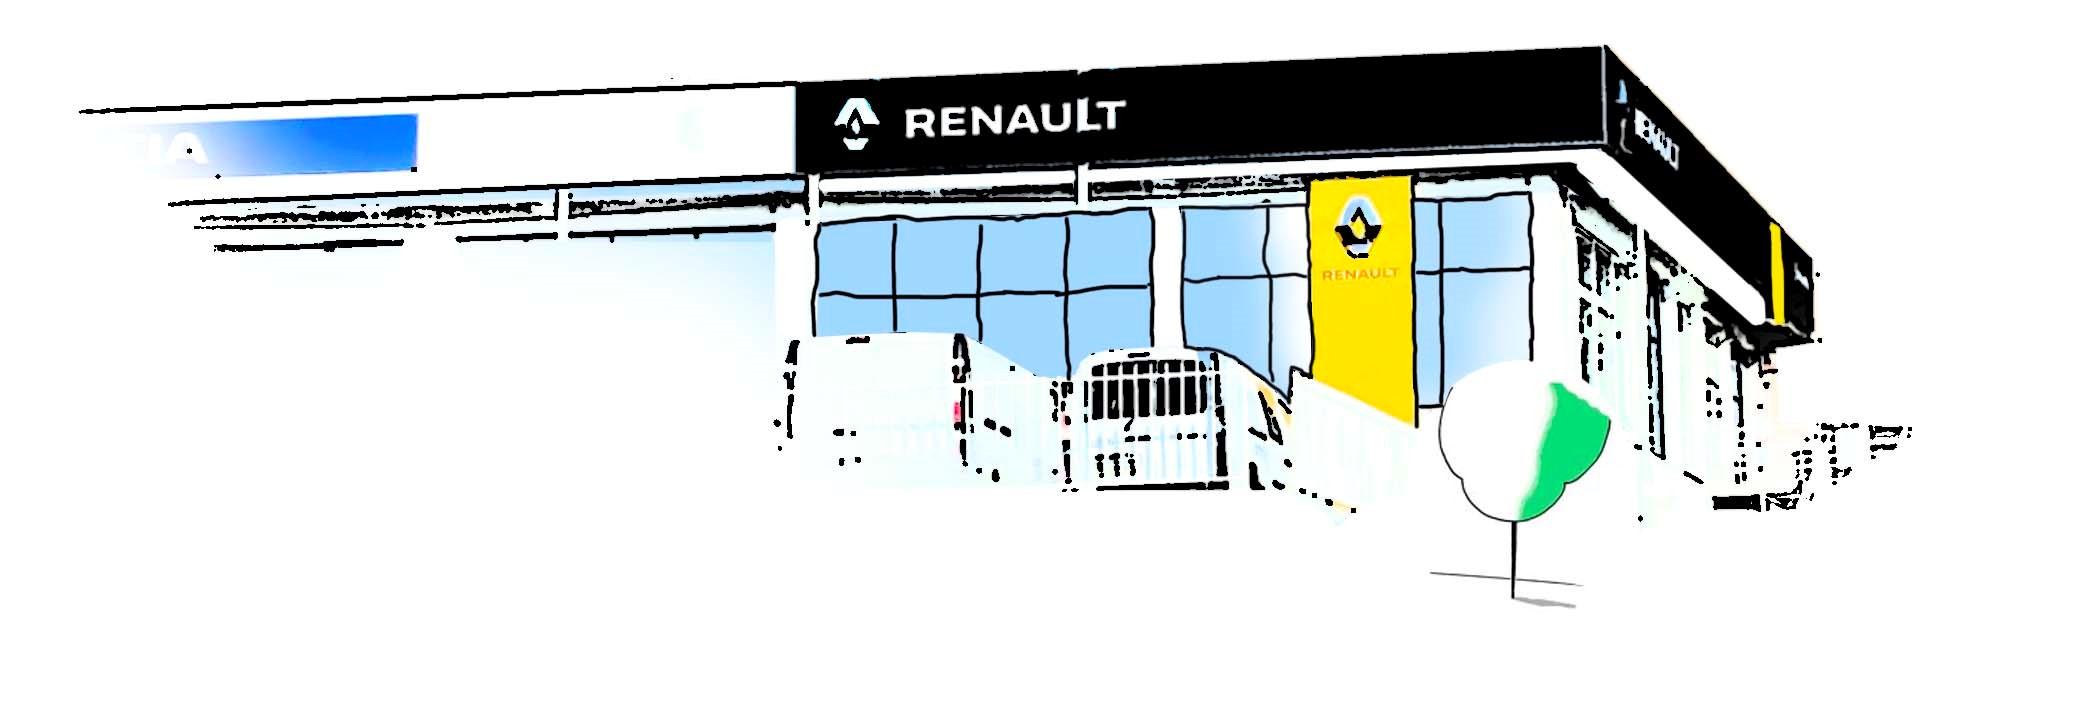 autonet • Renault navodno sprema električni Twingo